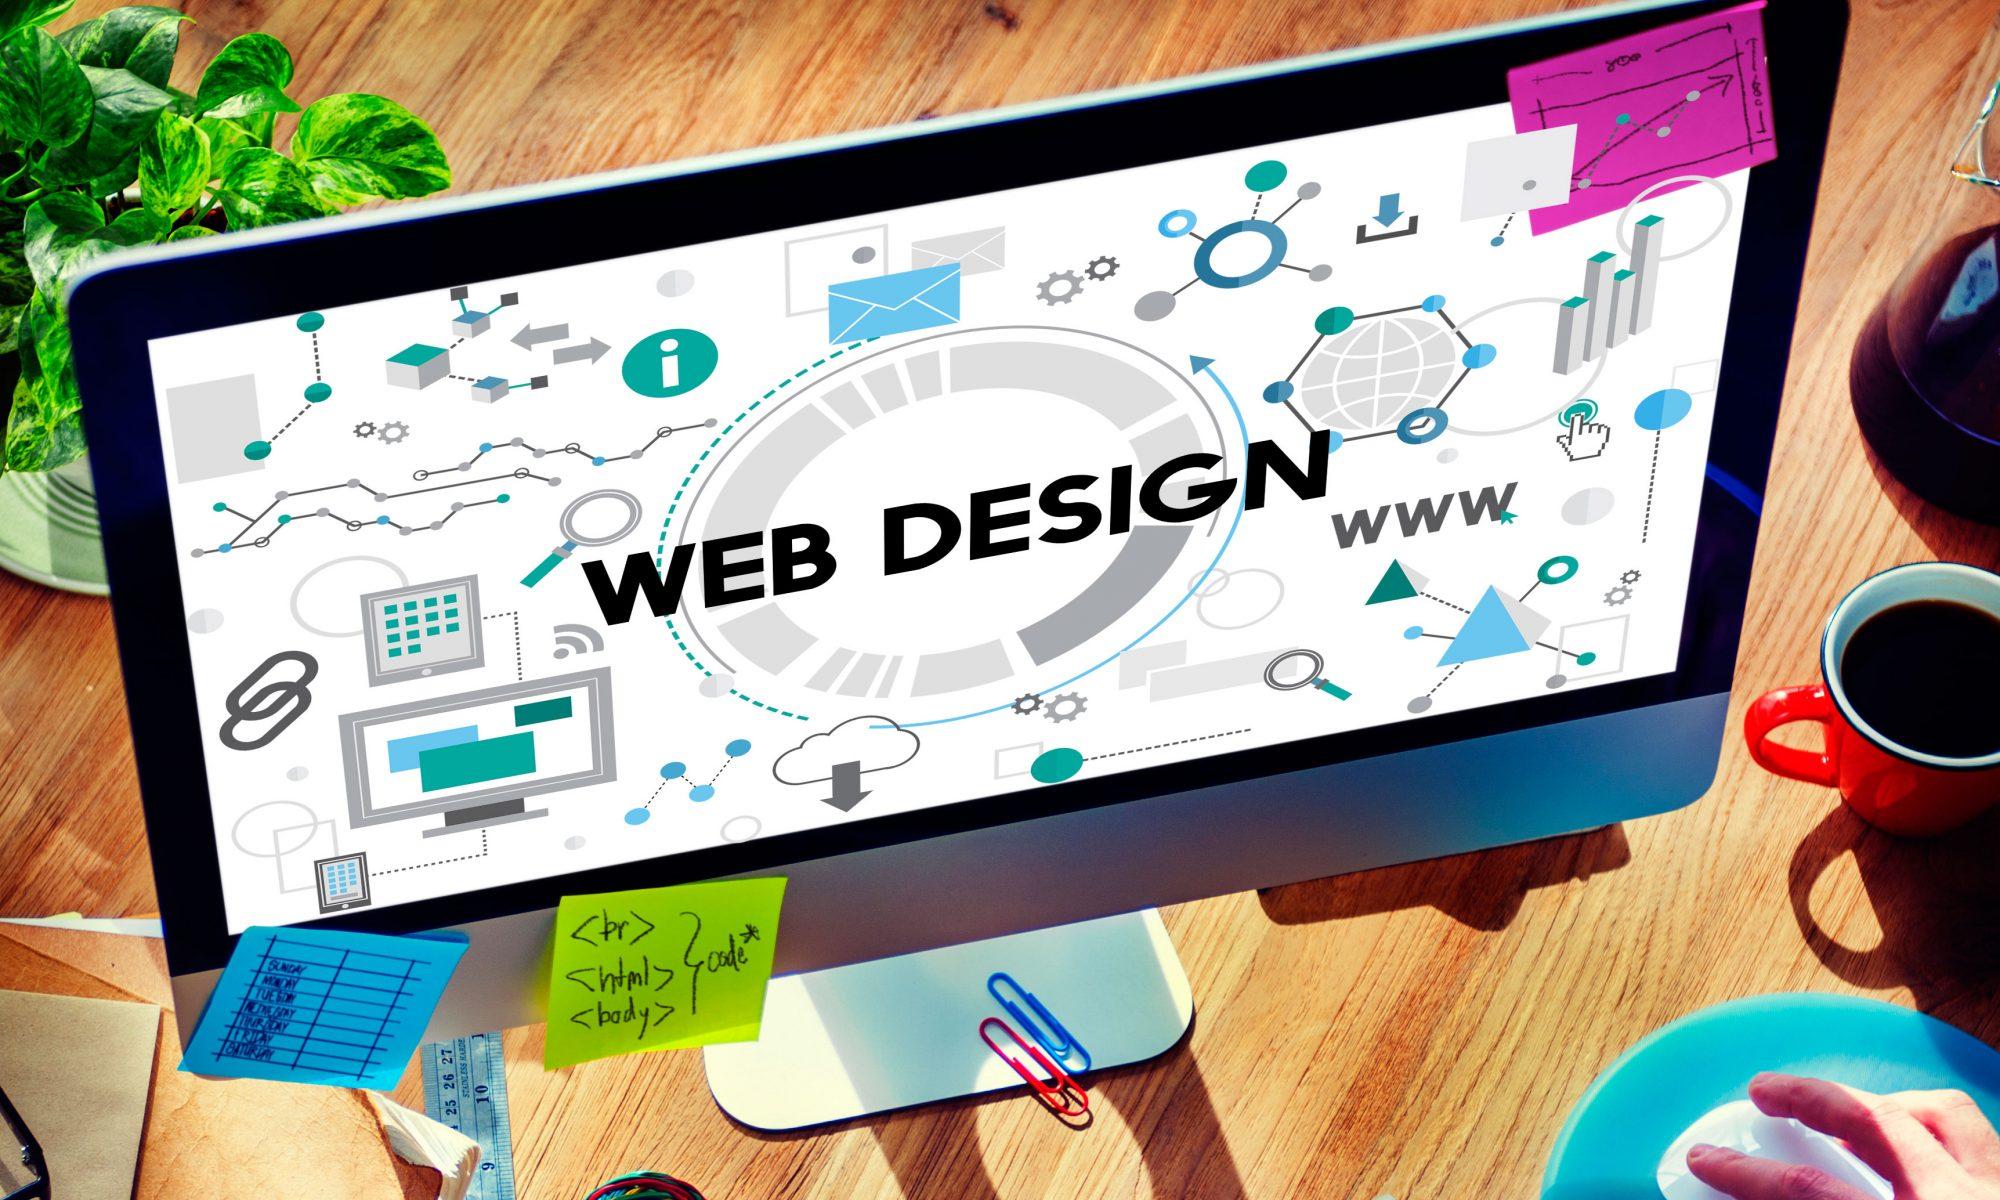 website design services in Calgary AB - Cornerstone Digital